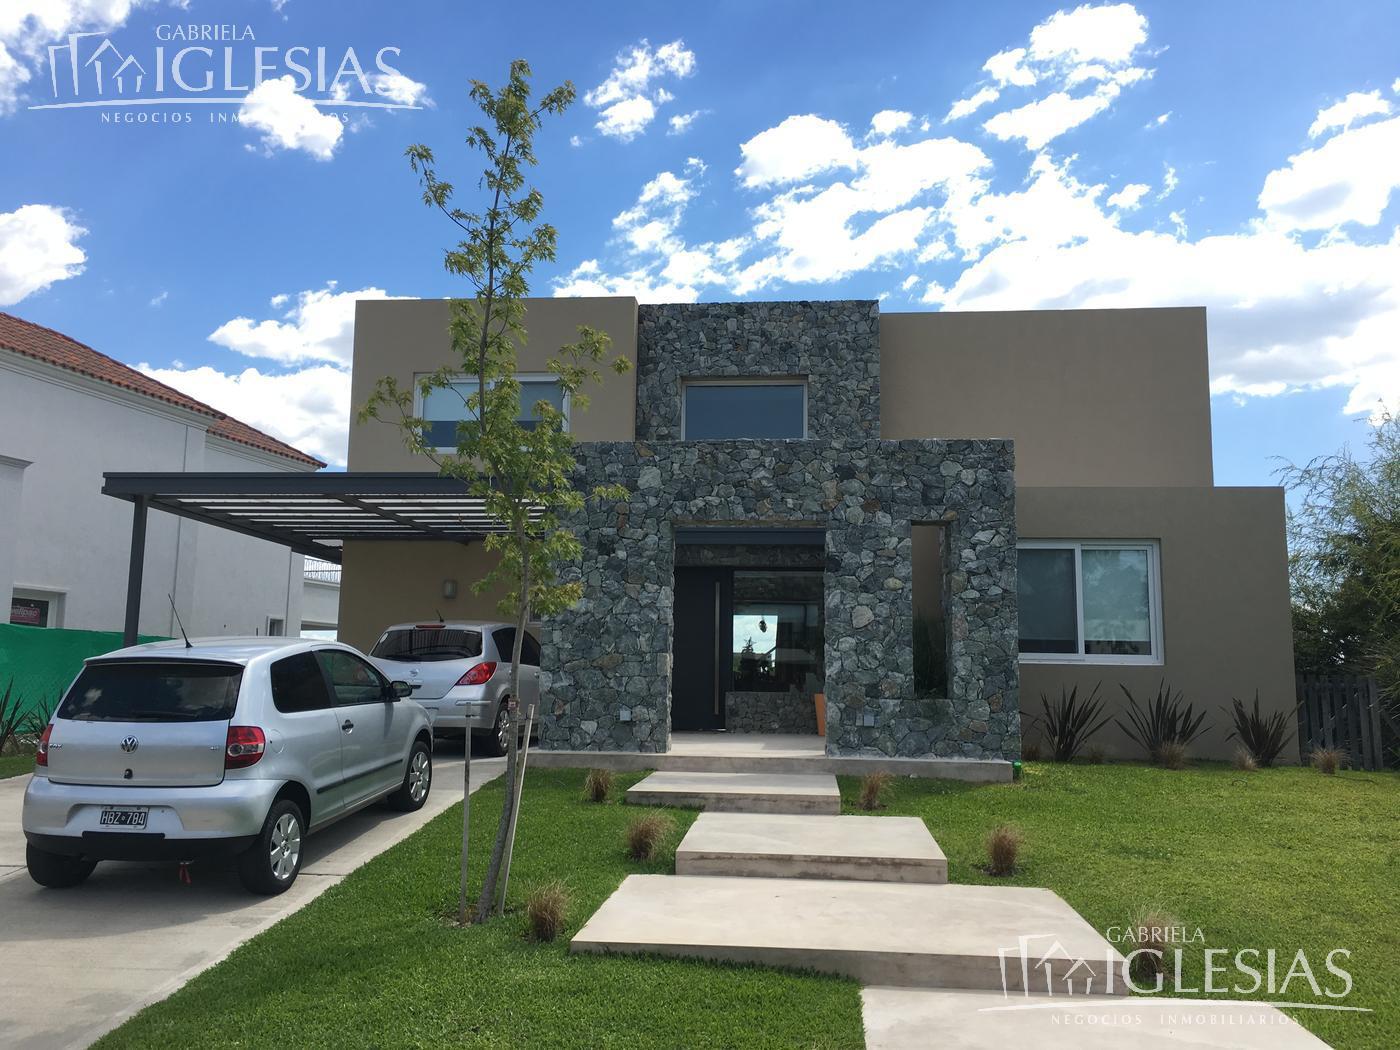 Casa en Alquiler temporario en Nordelta Los Lagos a Alquiler temporario - $ 135.000 / $ 110.000